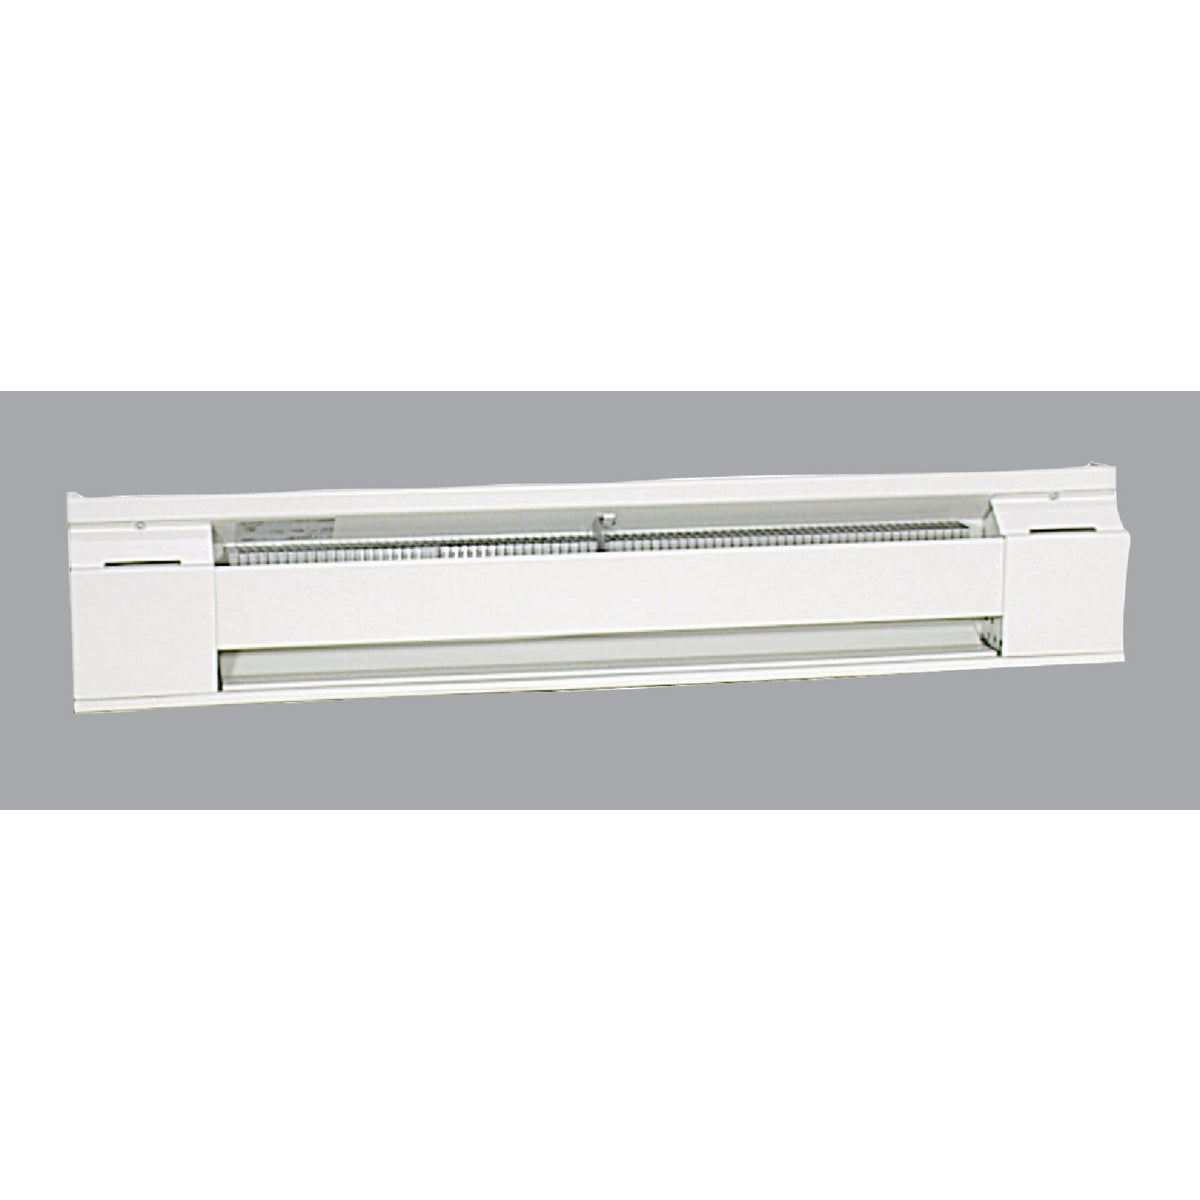 3' Baseboard Heater